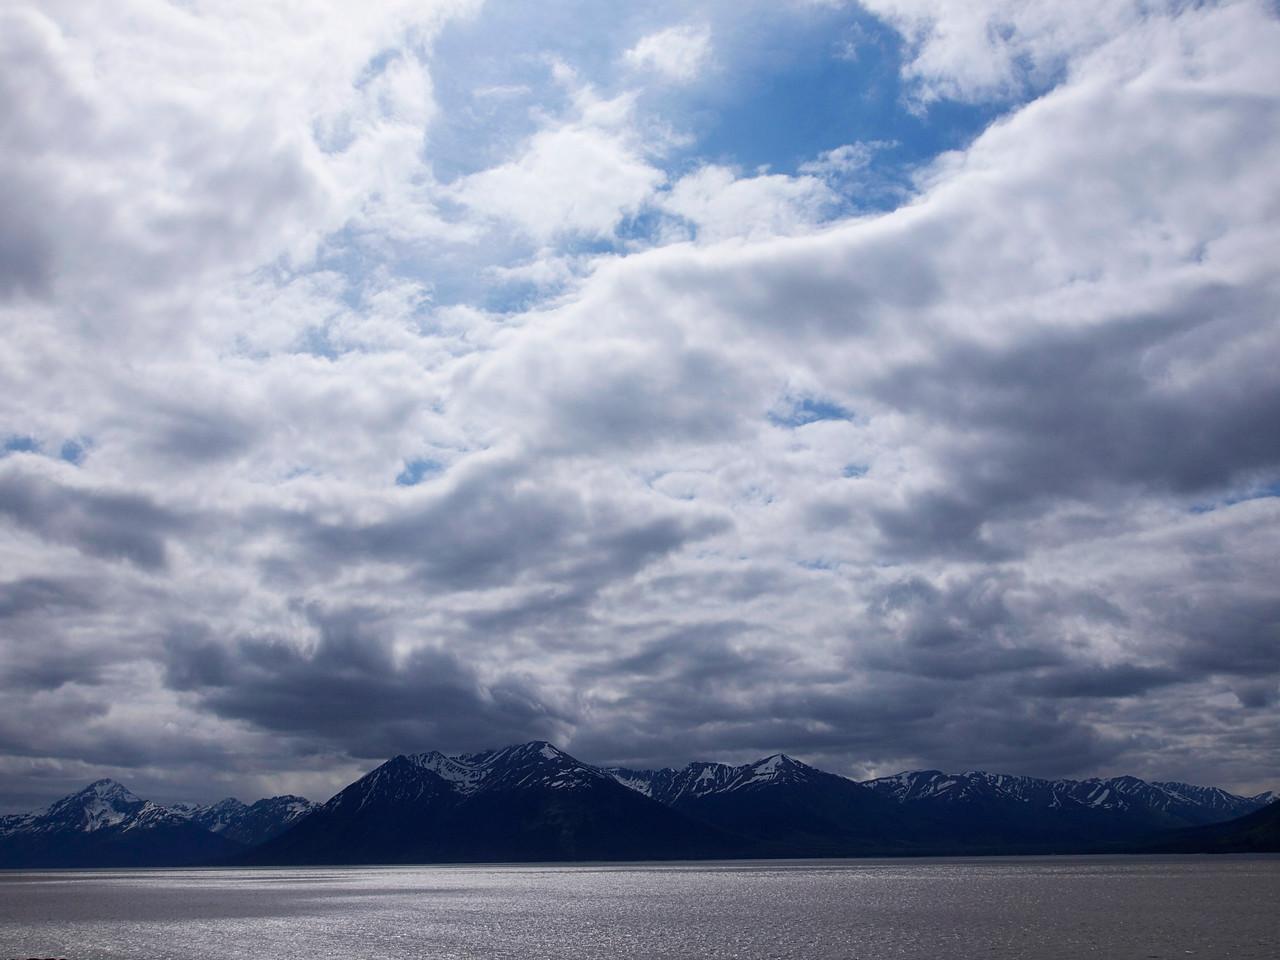 Turnagain Arm - Anchorage, Alaska  By Valerie Mellema  June 10, 2011